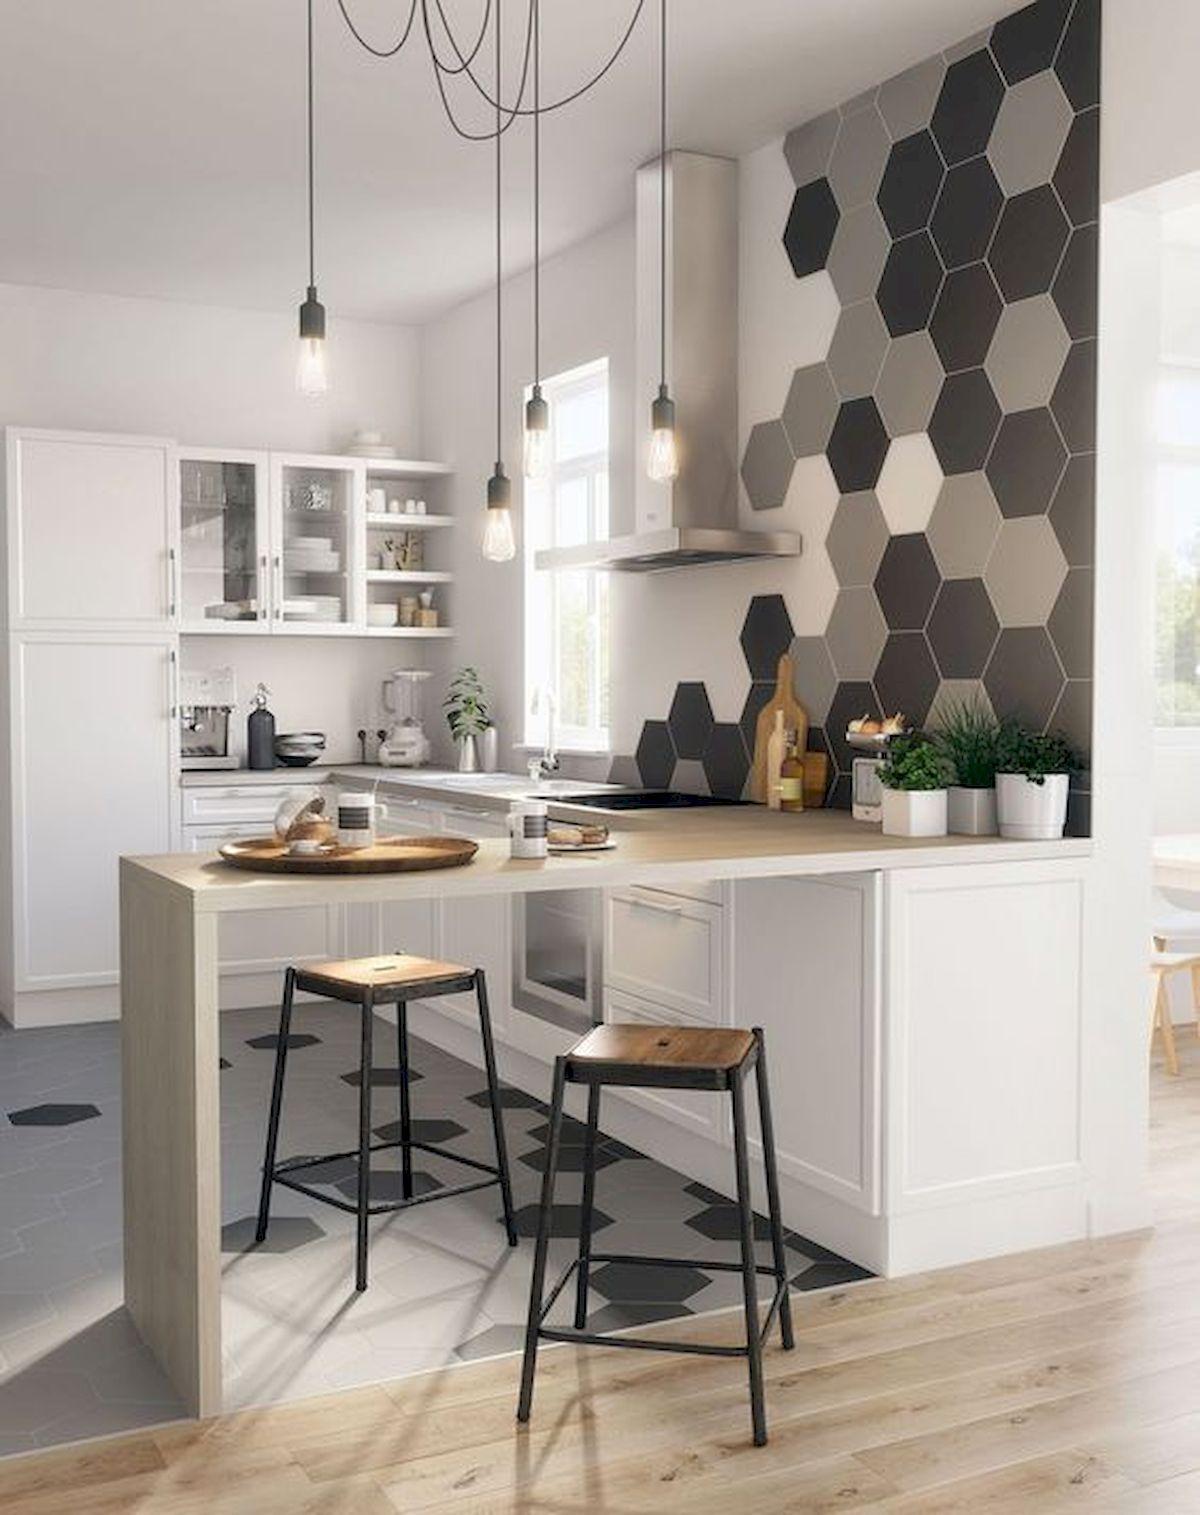 40 Best Tile Flooring Designs Ideas For Modern Kitchen (27)